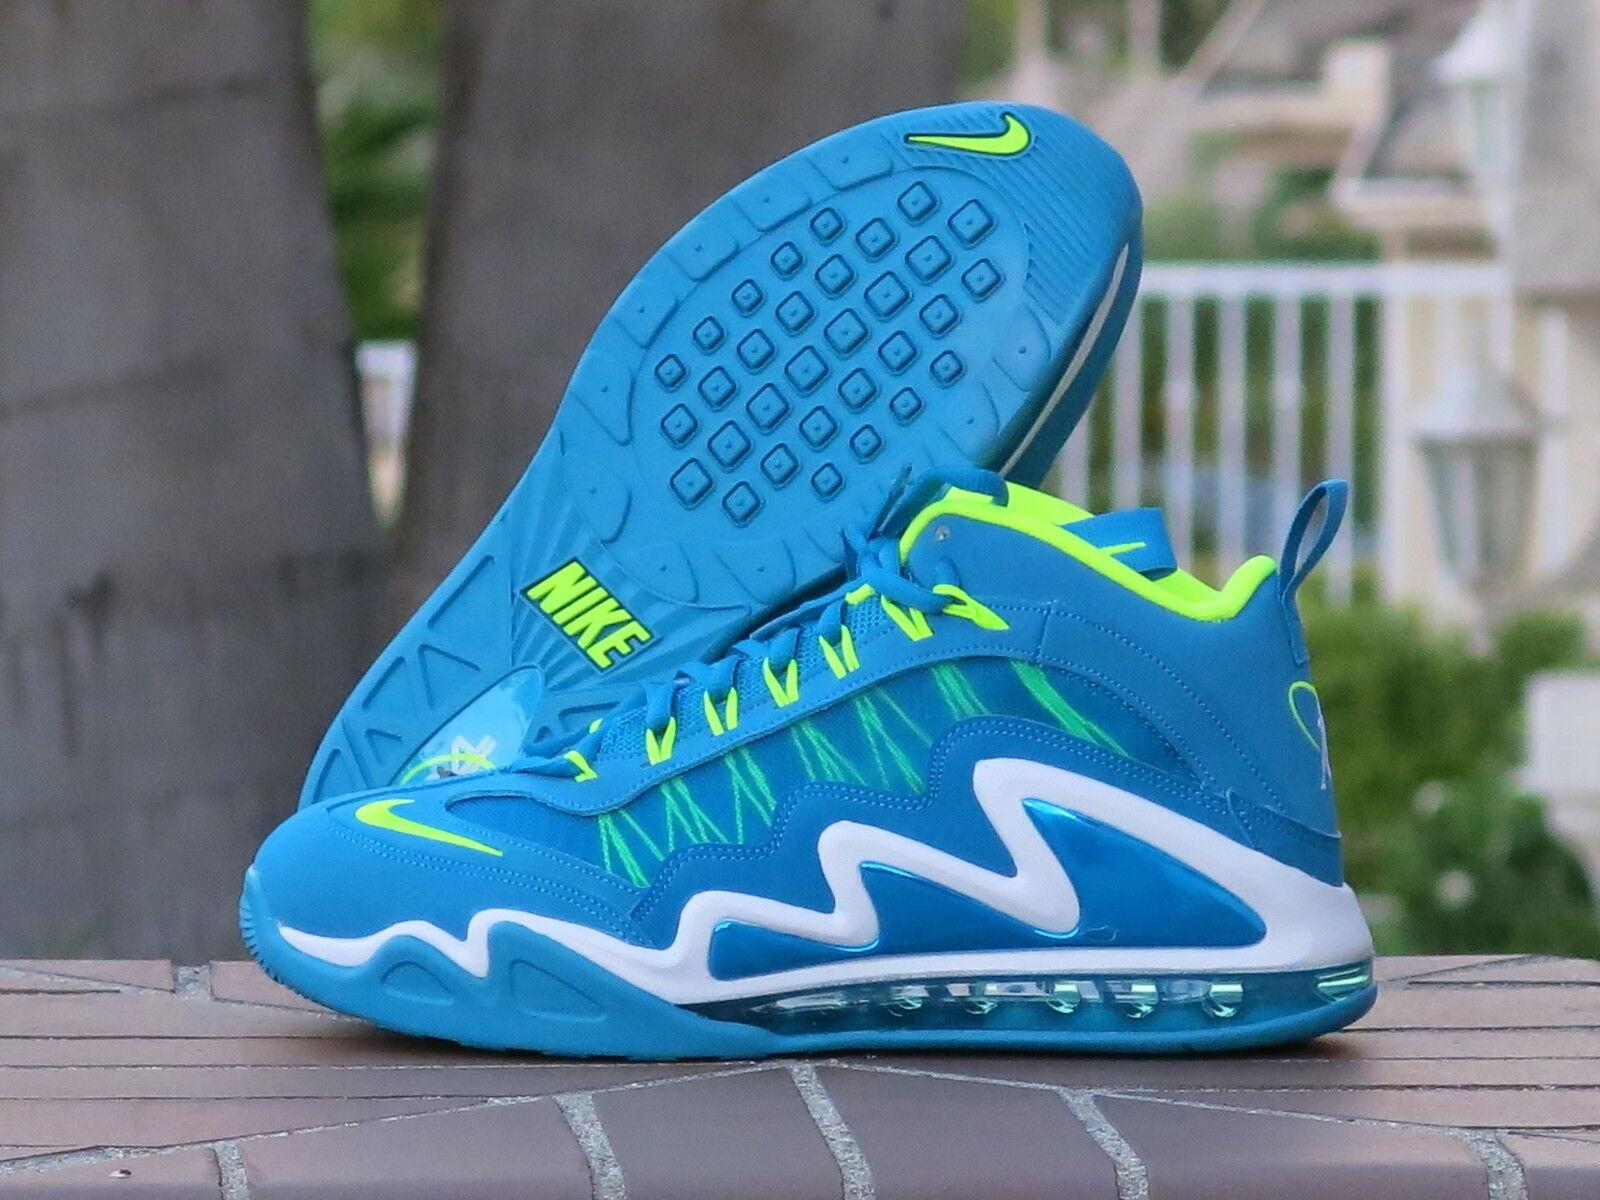 Nike Air Max 360 Diamond Griff Training Athletic Sneakers 580398-400 SZ 10